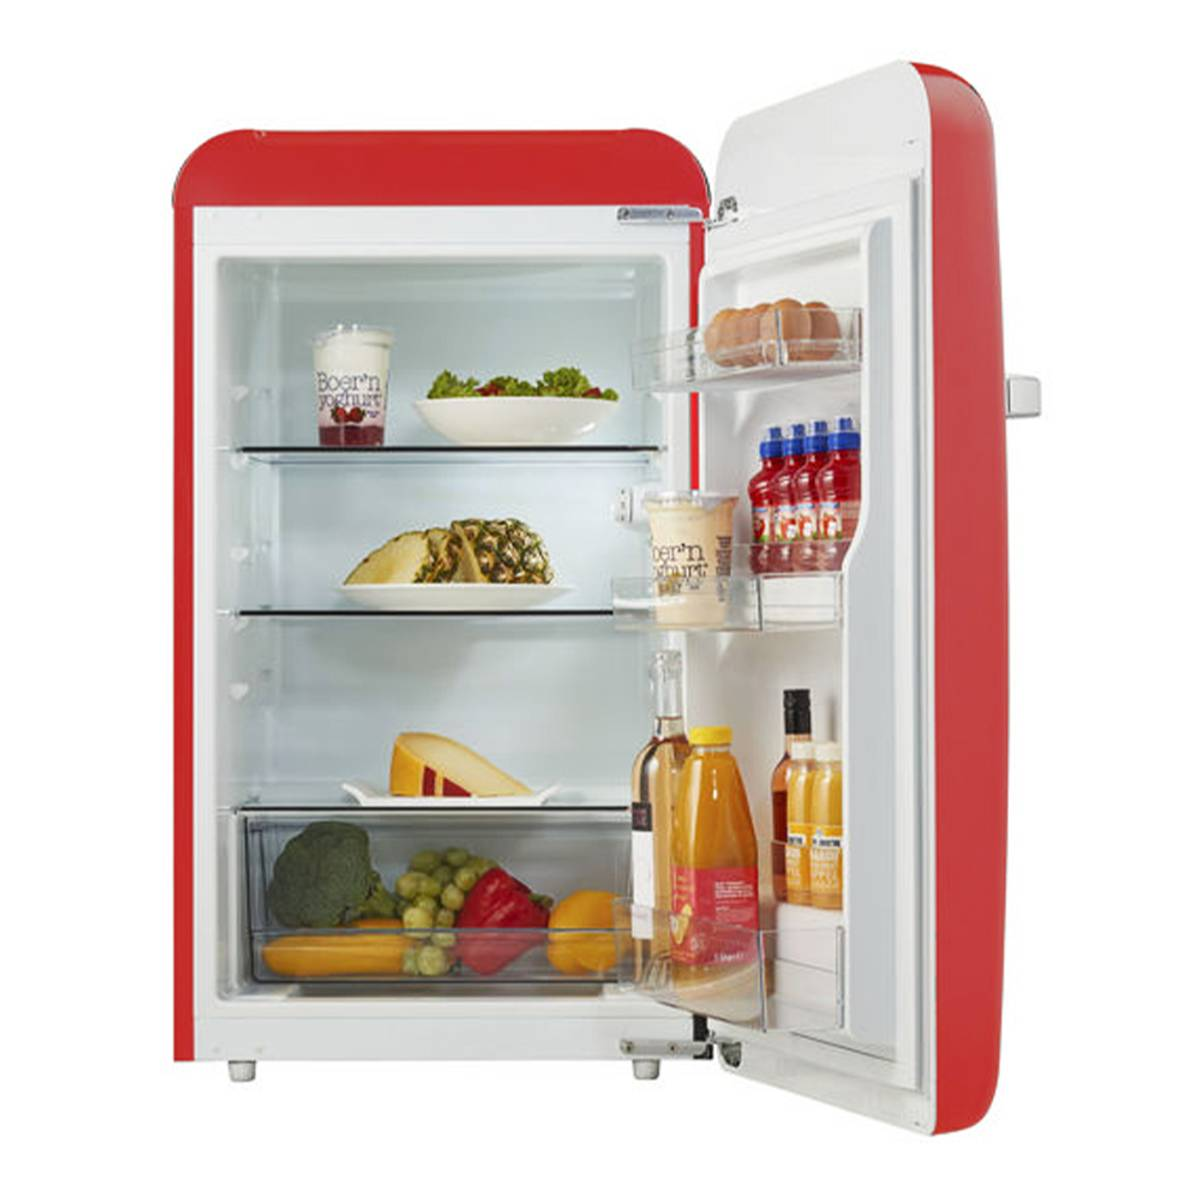 Temptech rødt vintage kjøleskap